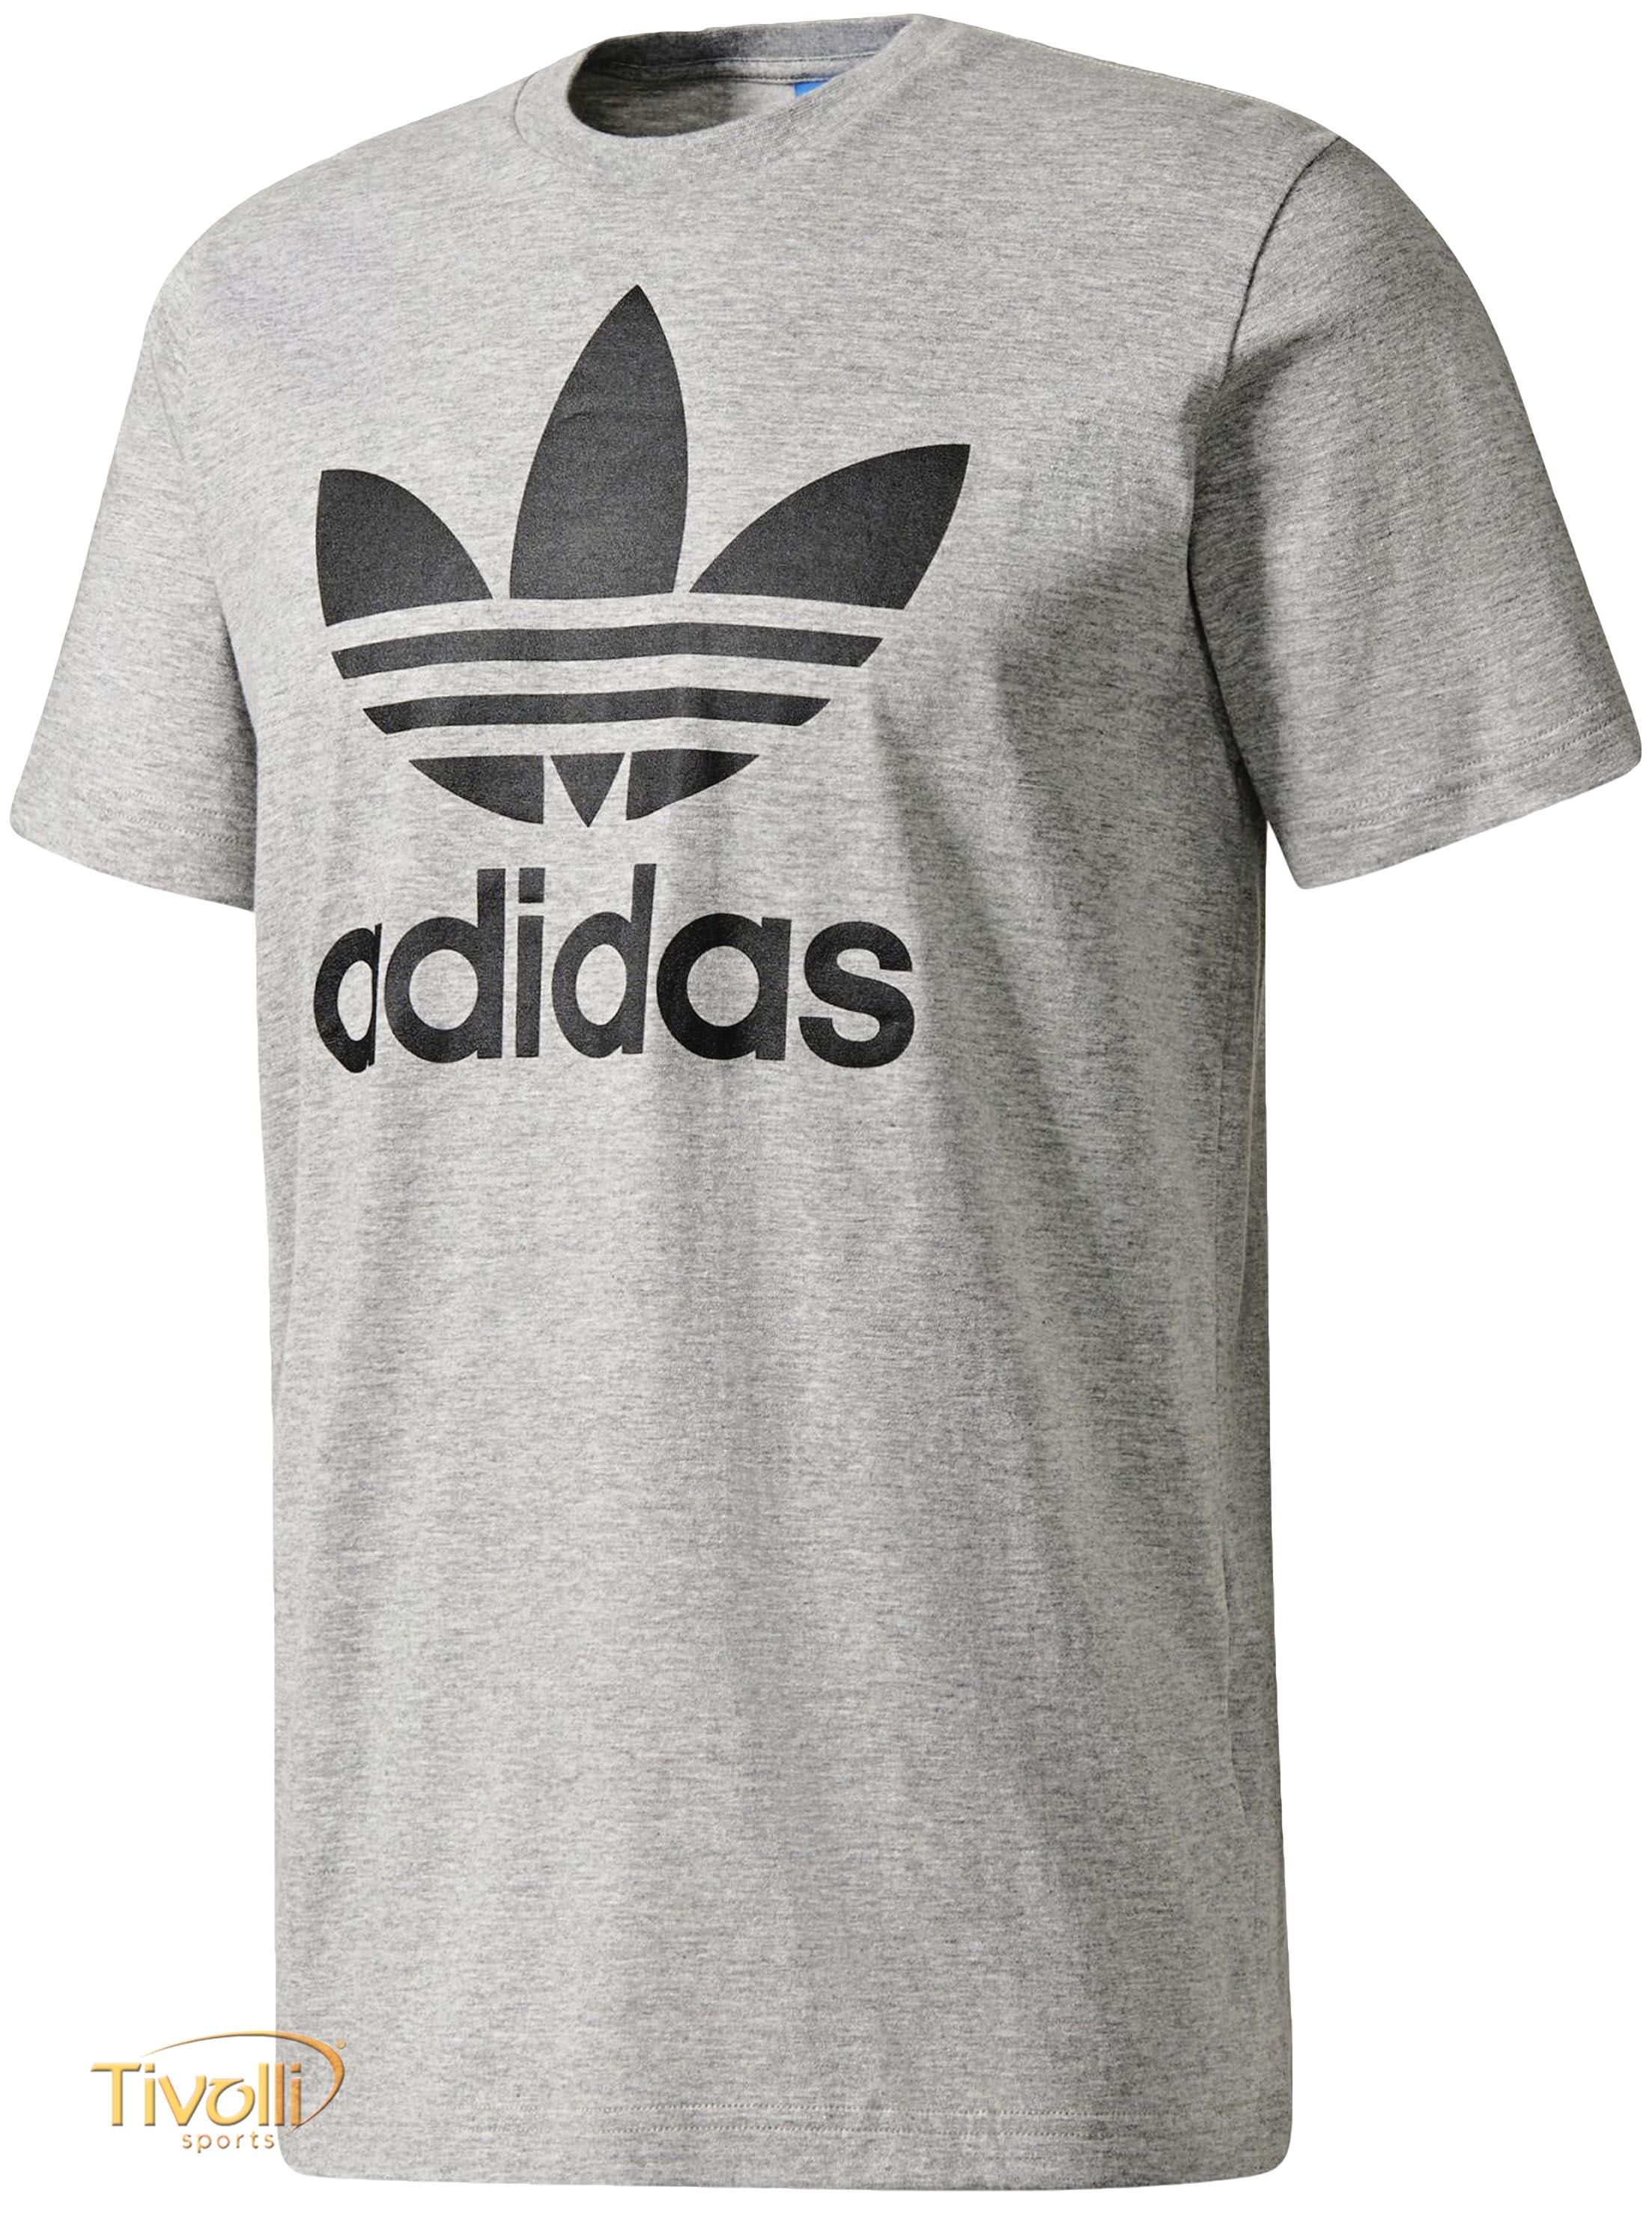 840b73f8908 Camiseta Adidas Originals Trefoil   Cinza e Preta